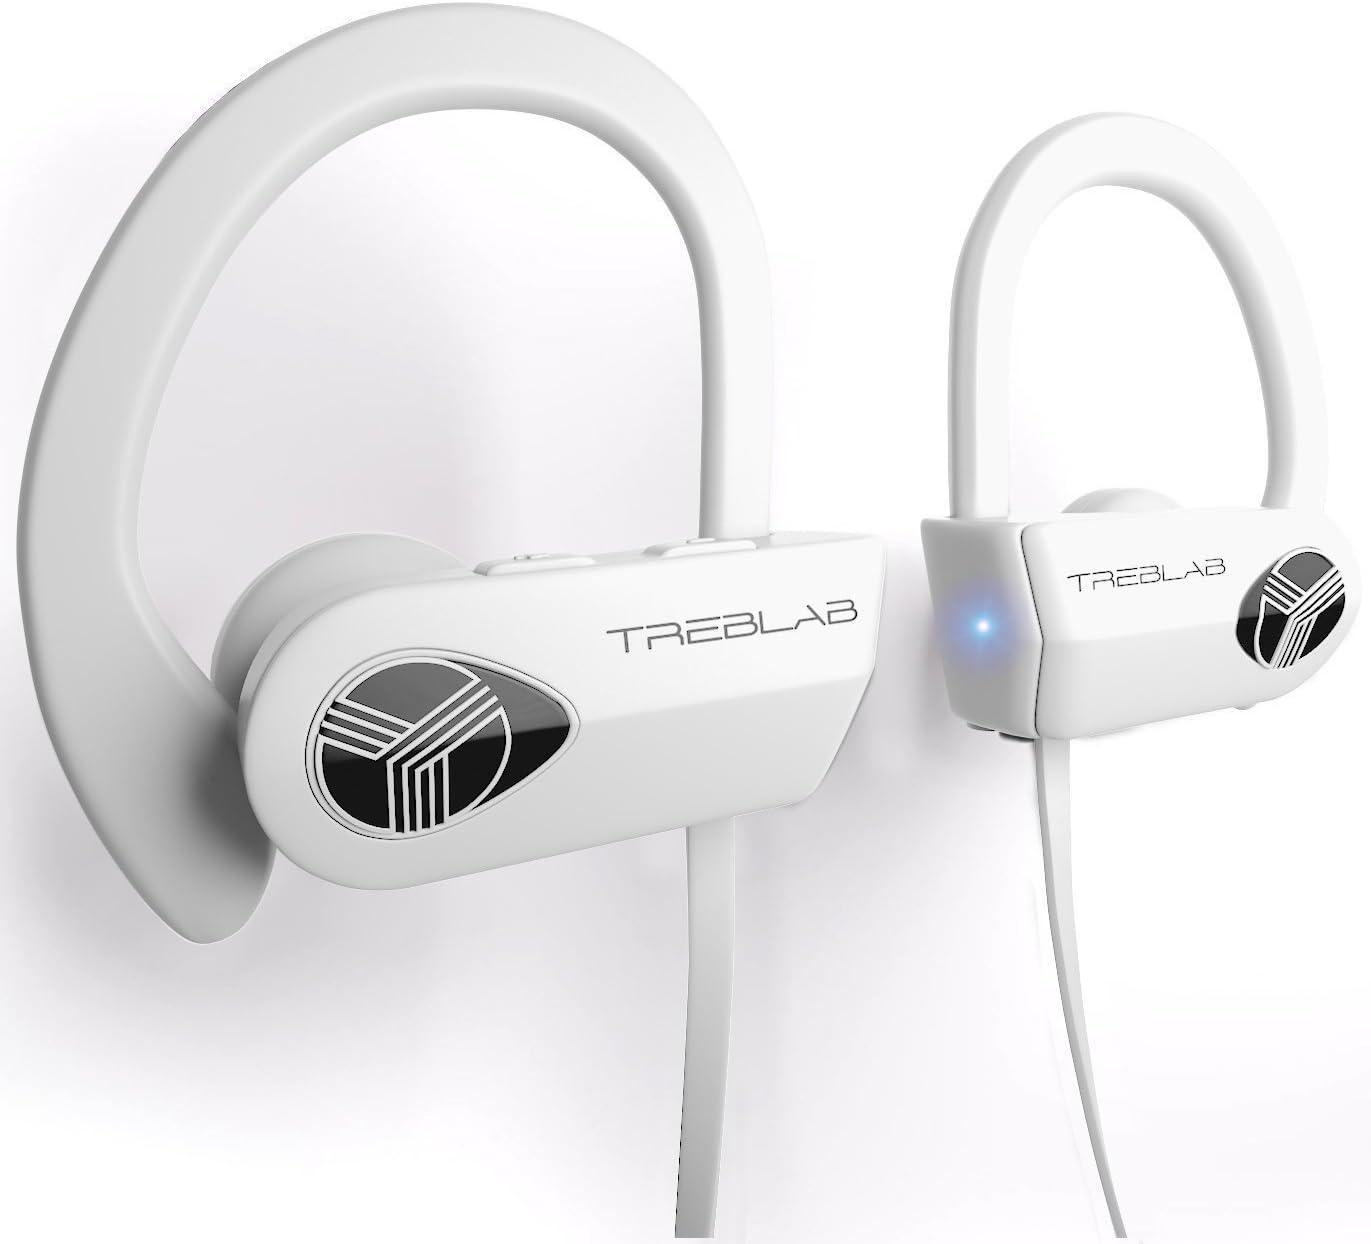 TREBLAB XR500 Bluetooth Headphones, Best Wireless Earbuds for Sports, Running or Gym Workout. IPX7 Waterproof, Sweatproof, Secure-Fit Headset. Noise Cancelling Earphones w/Mic